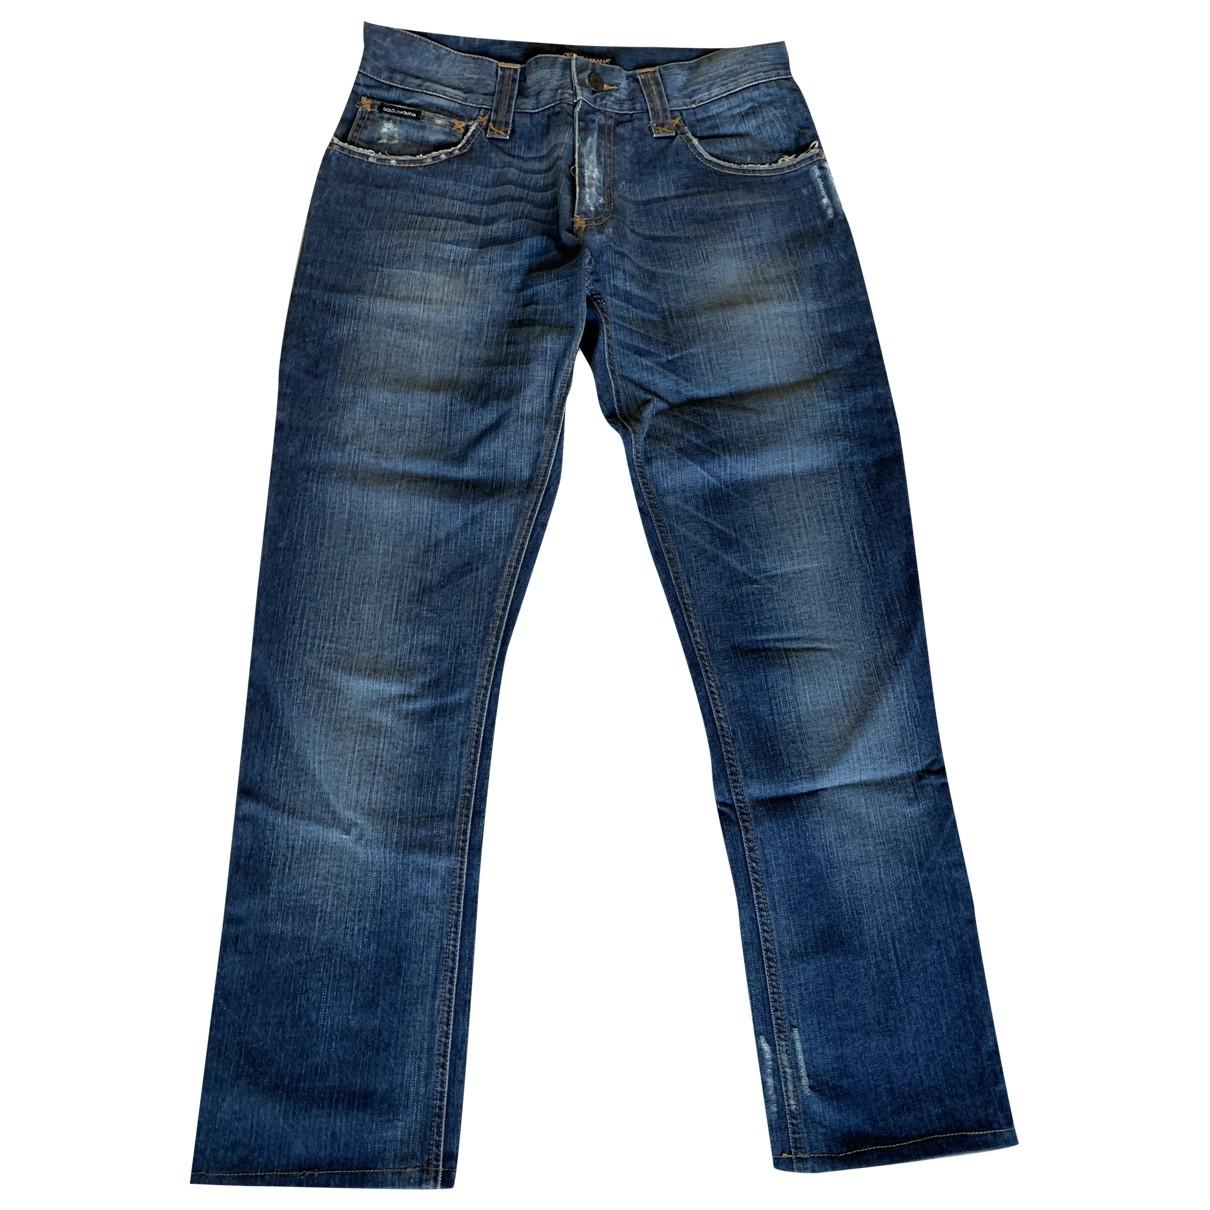 Dolce & Gabbana \N Navy Cotton Jeans for Men 42 FR